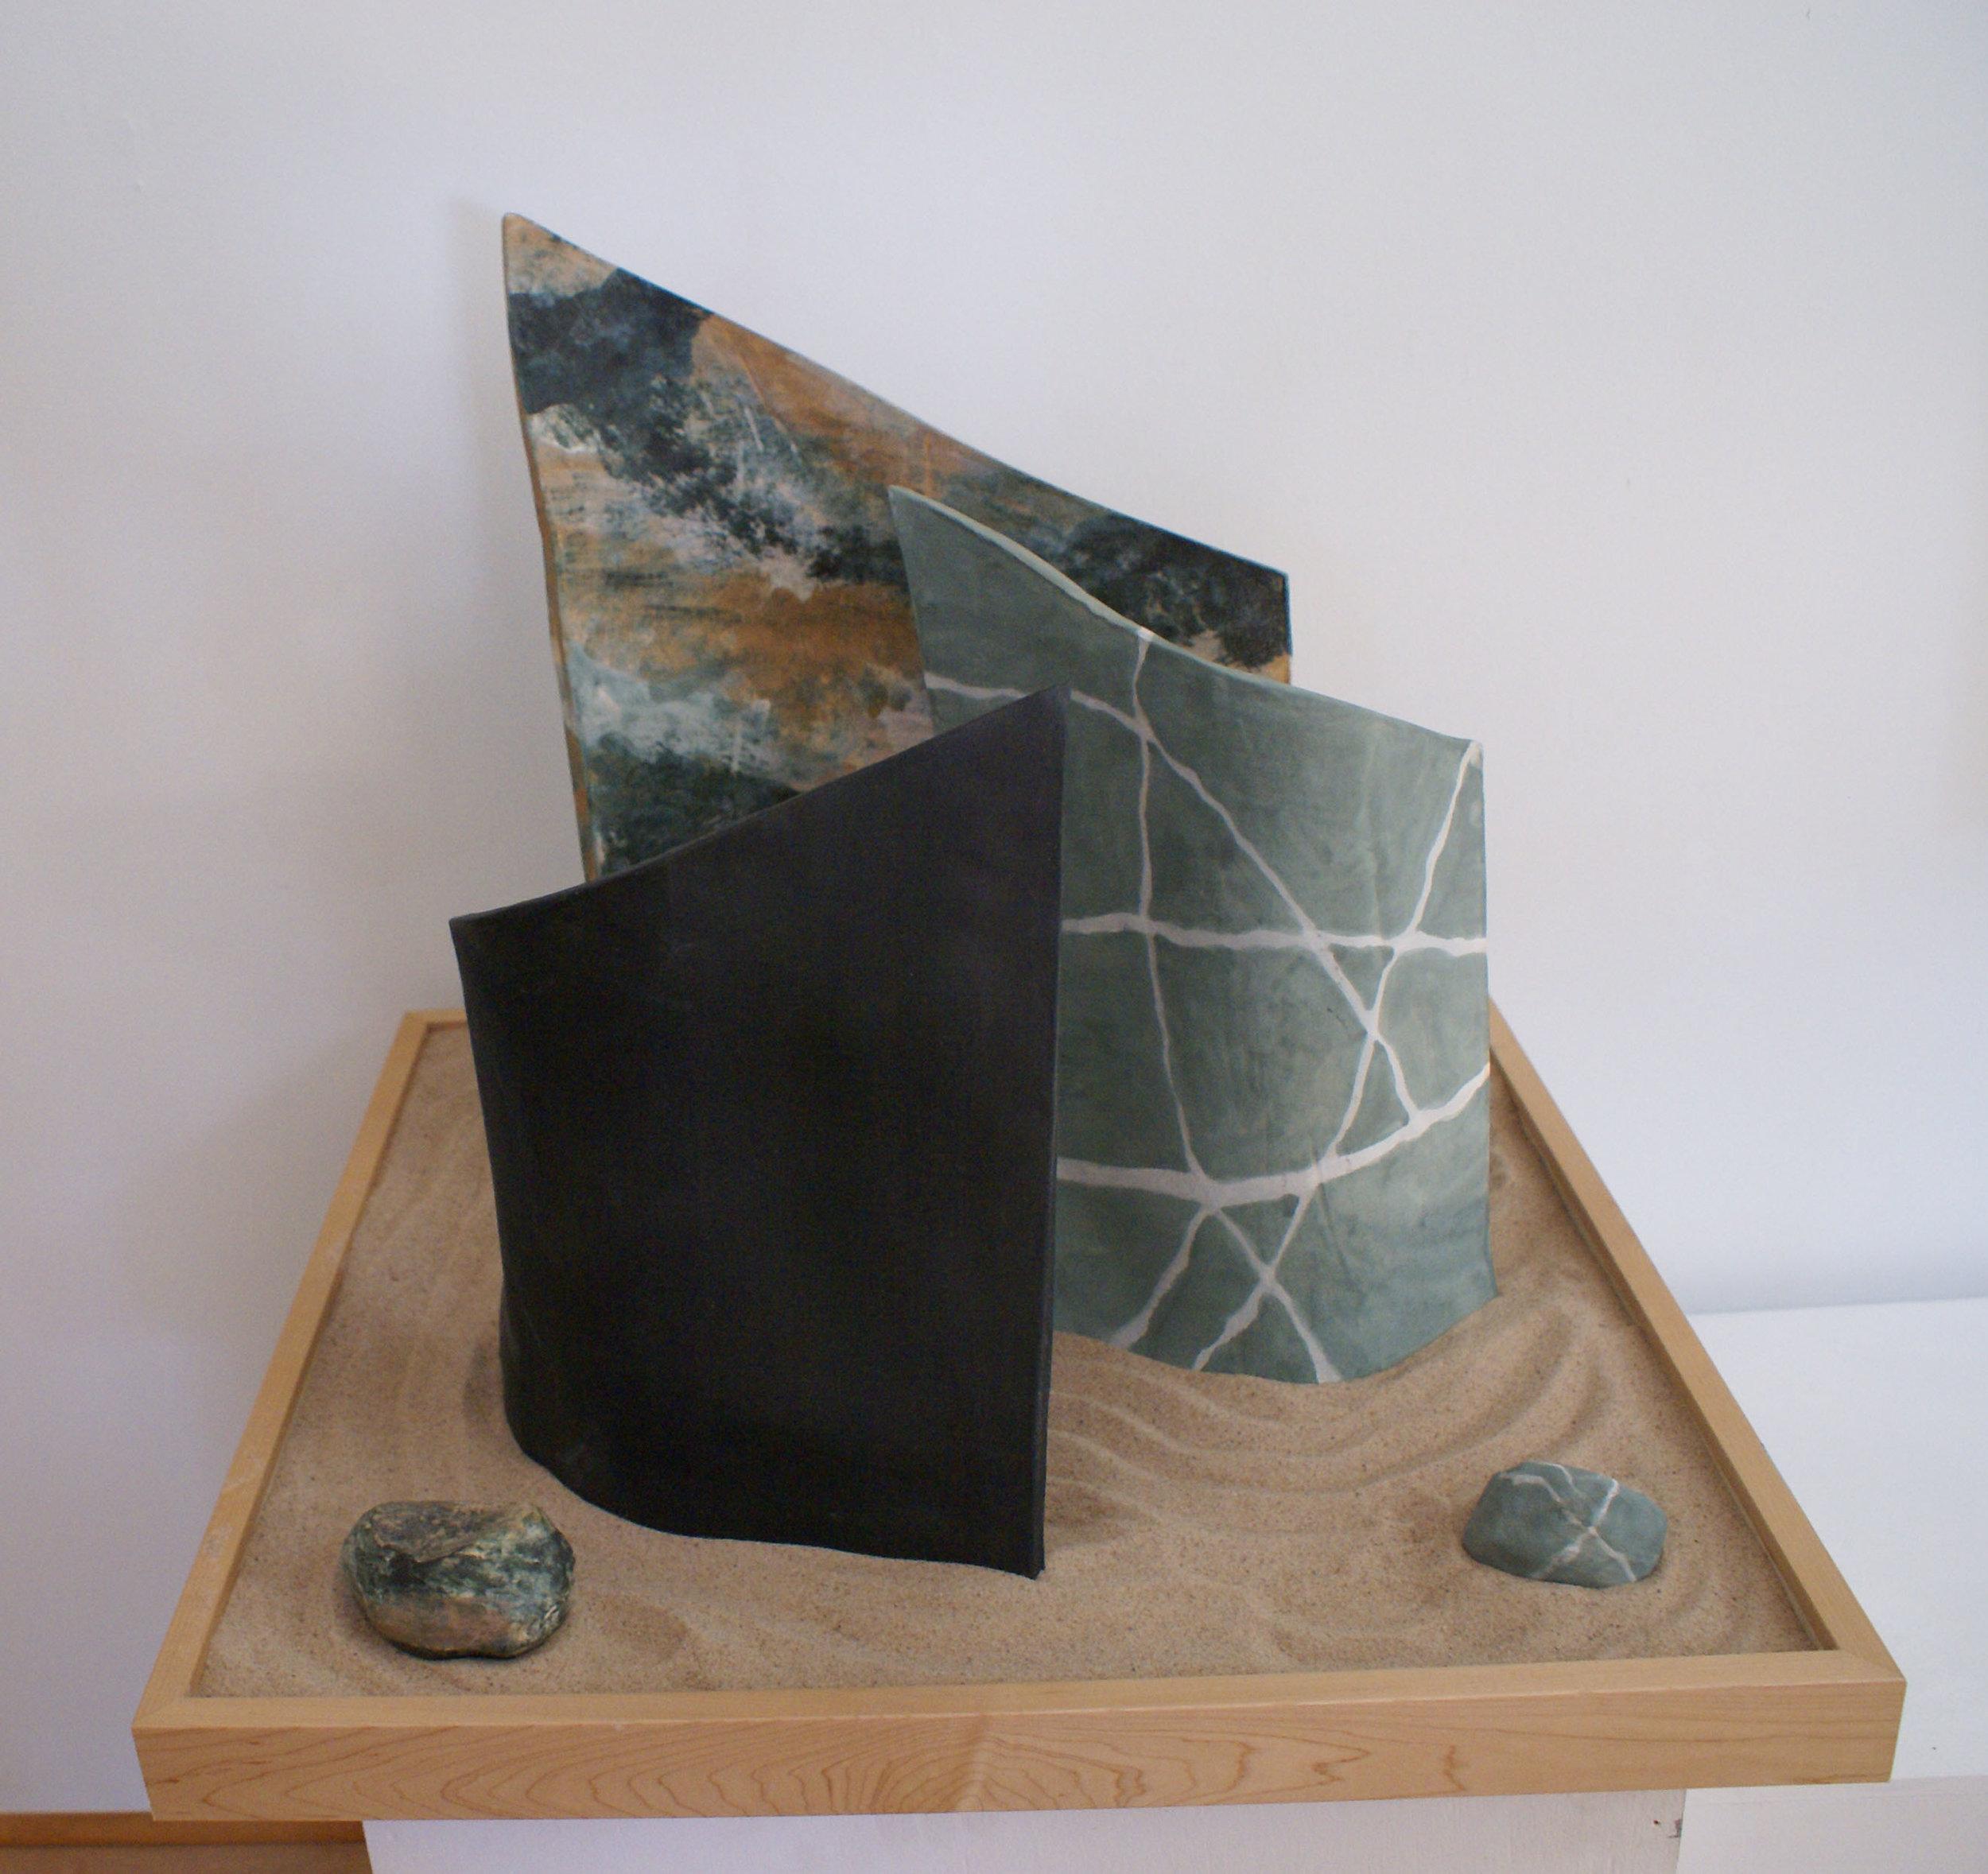 Inspired by Lake Erie Shore Rocks